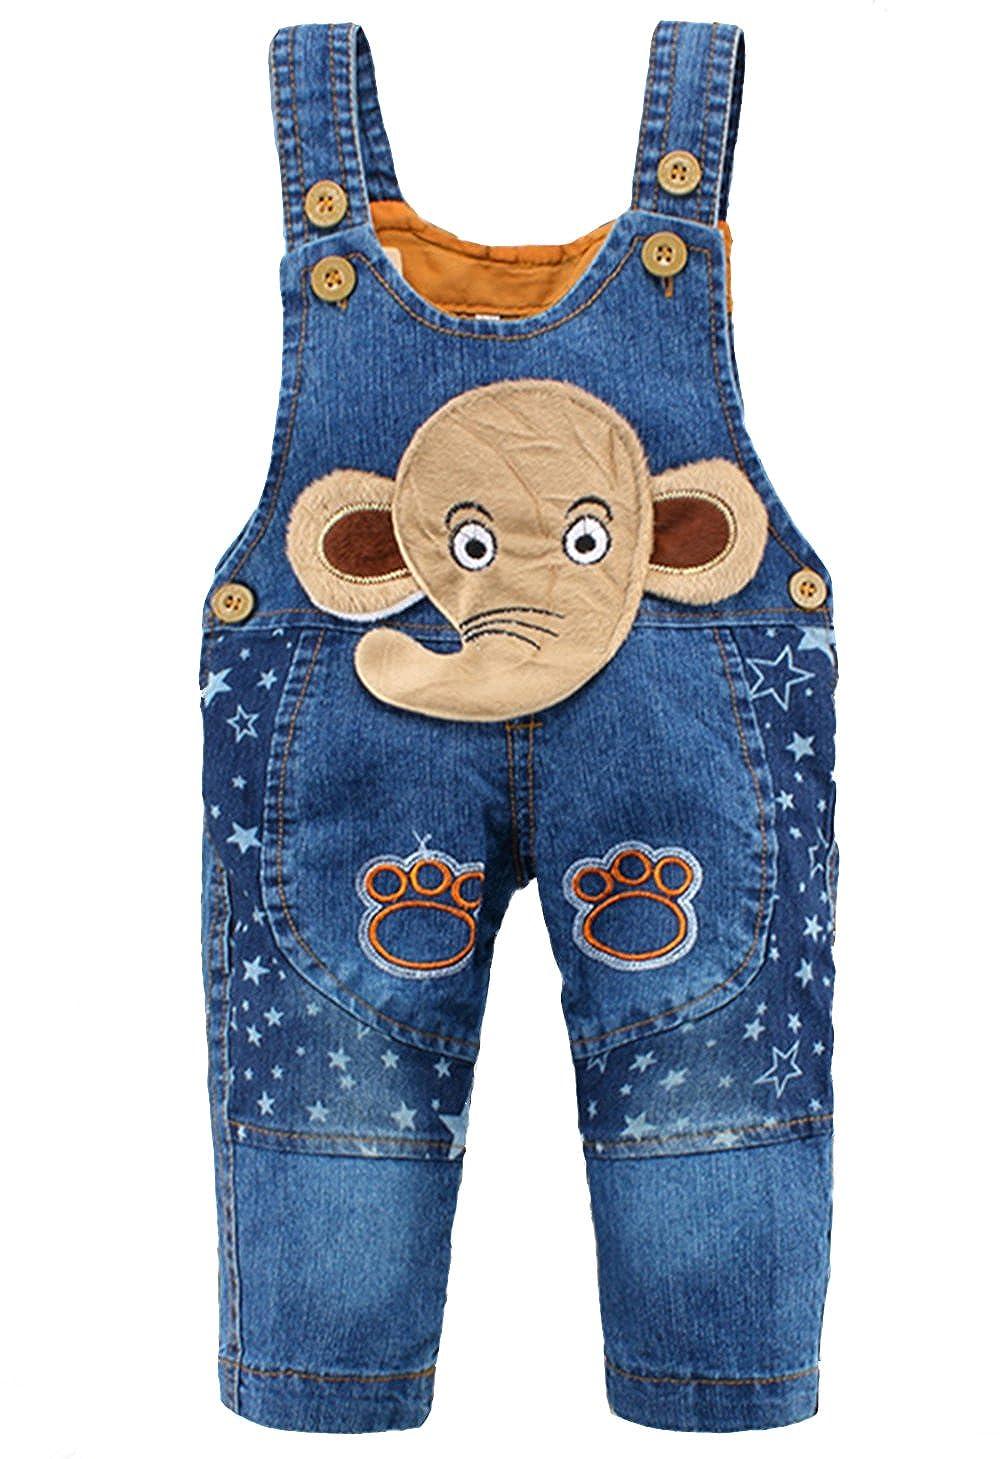 Kidscool Baby Cotton Denim Cute 3D Elephant Star Soft Overalls Blue